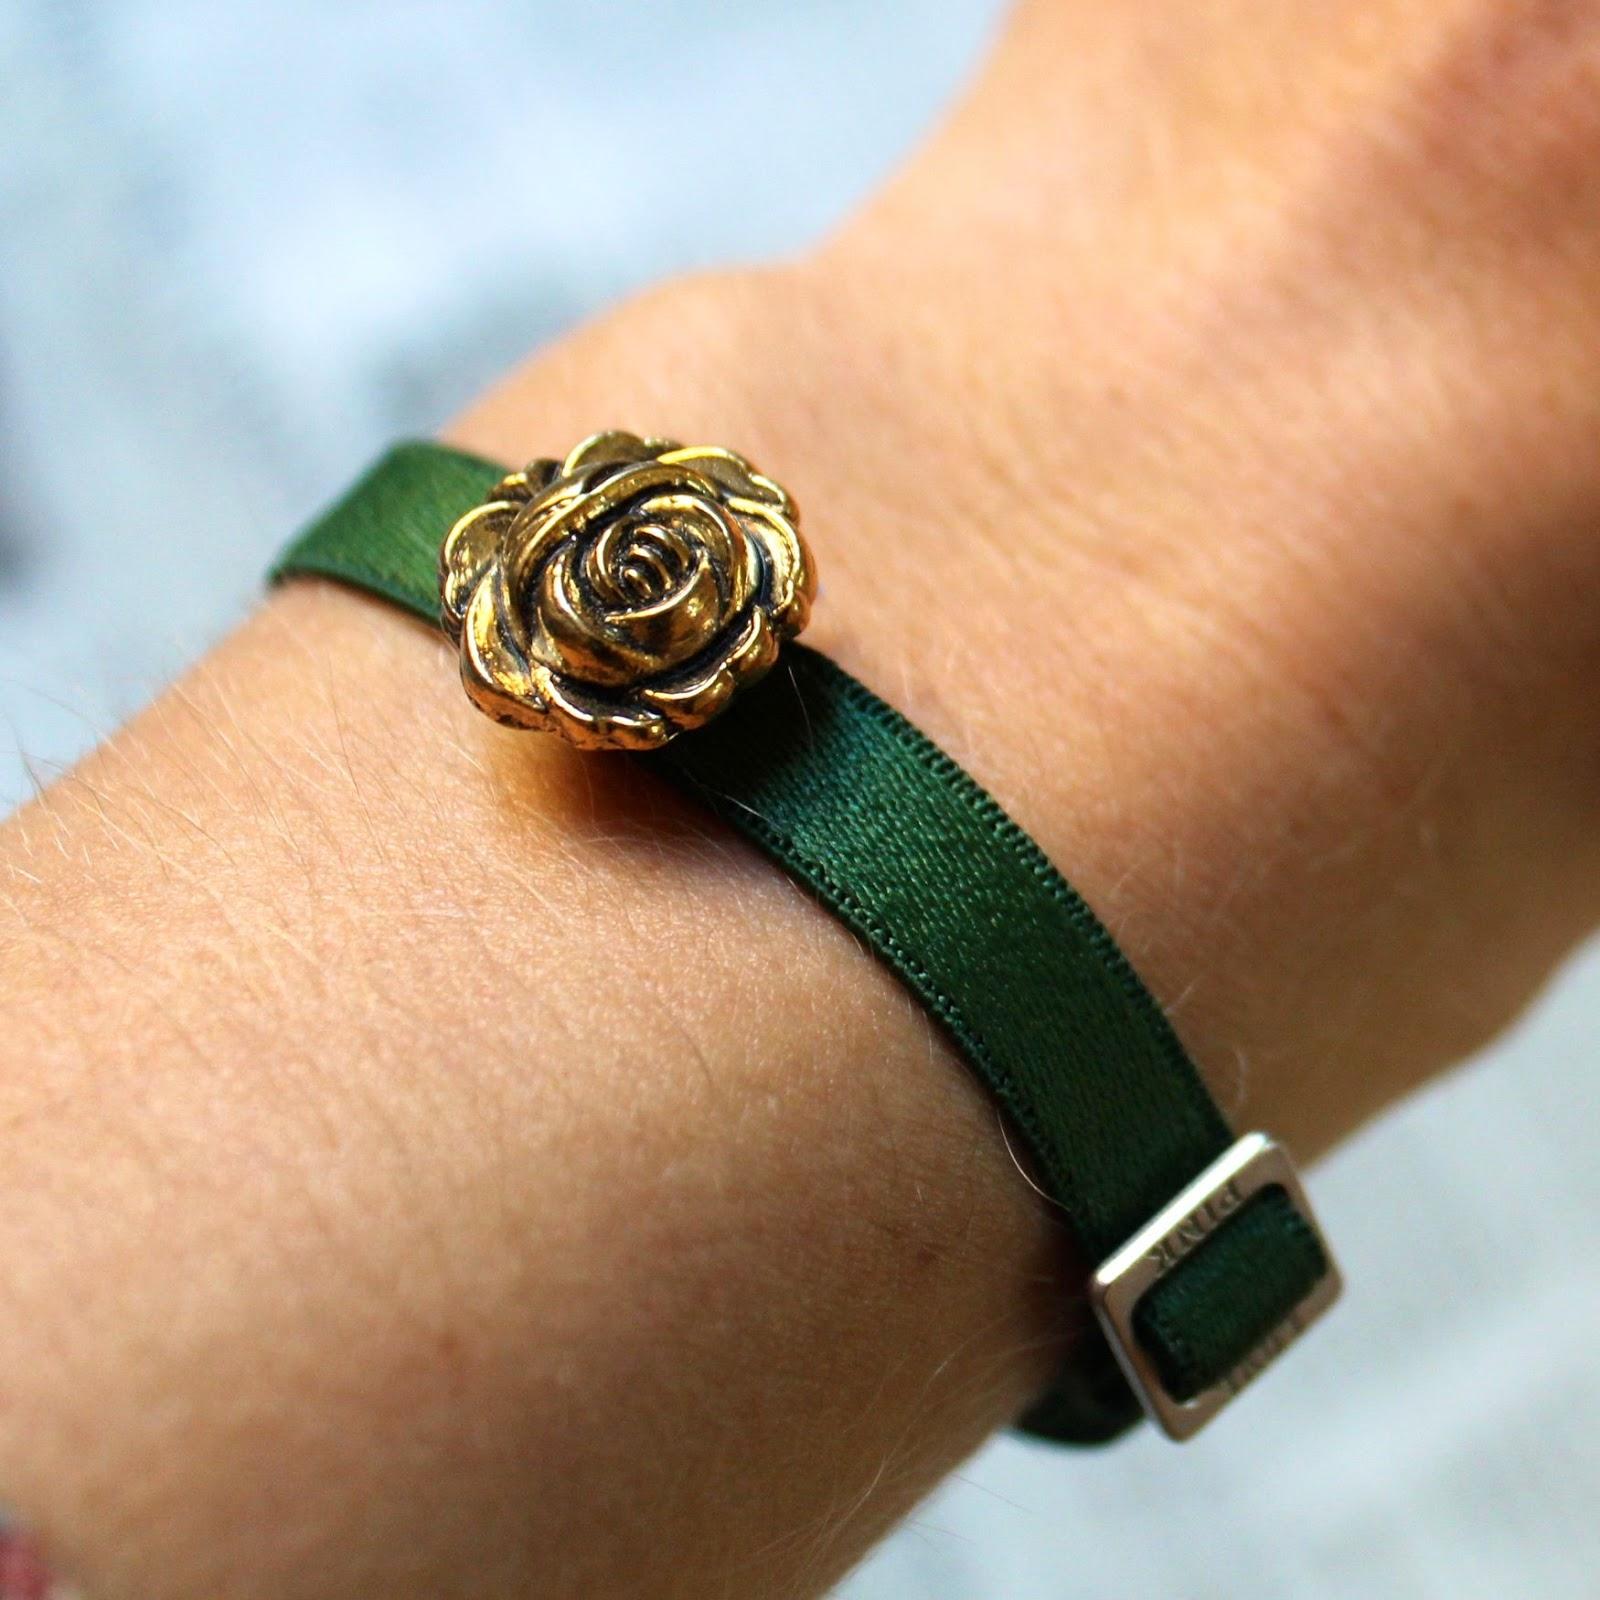 Adjustable bra strap bracelet